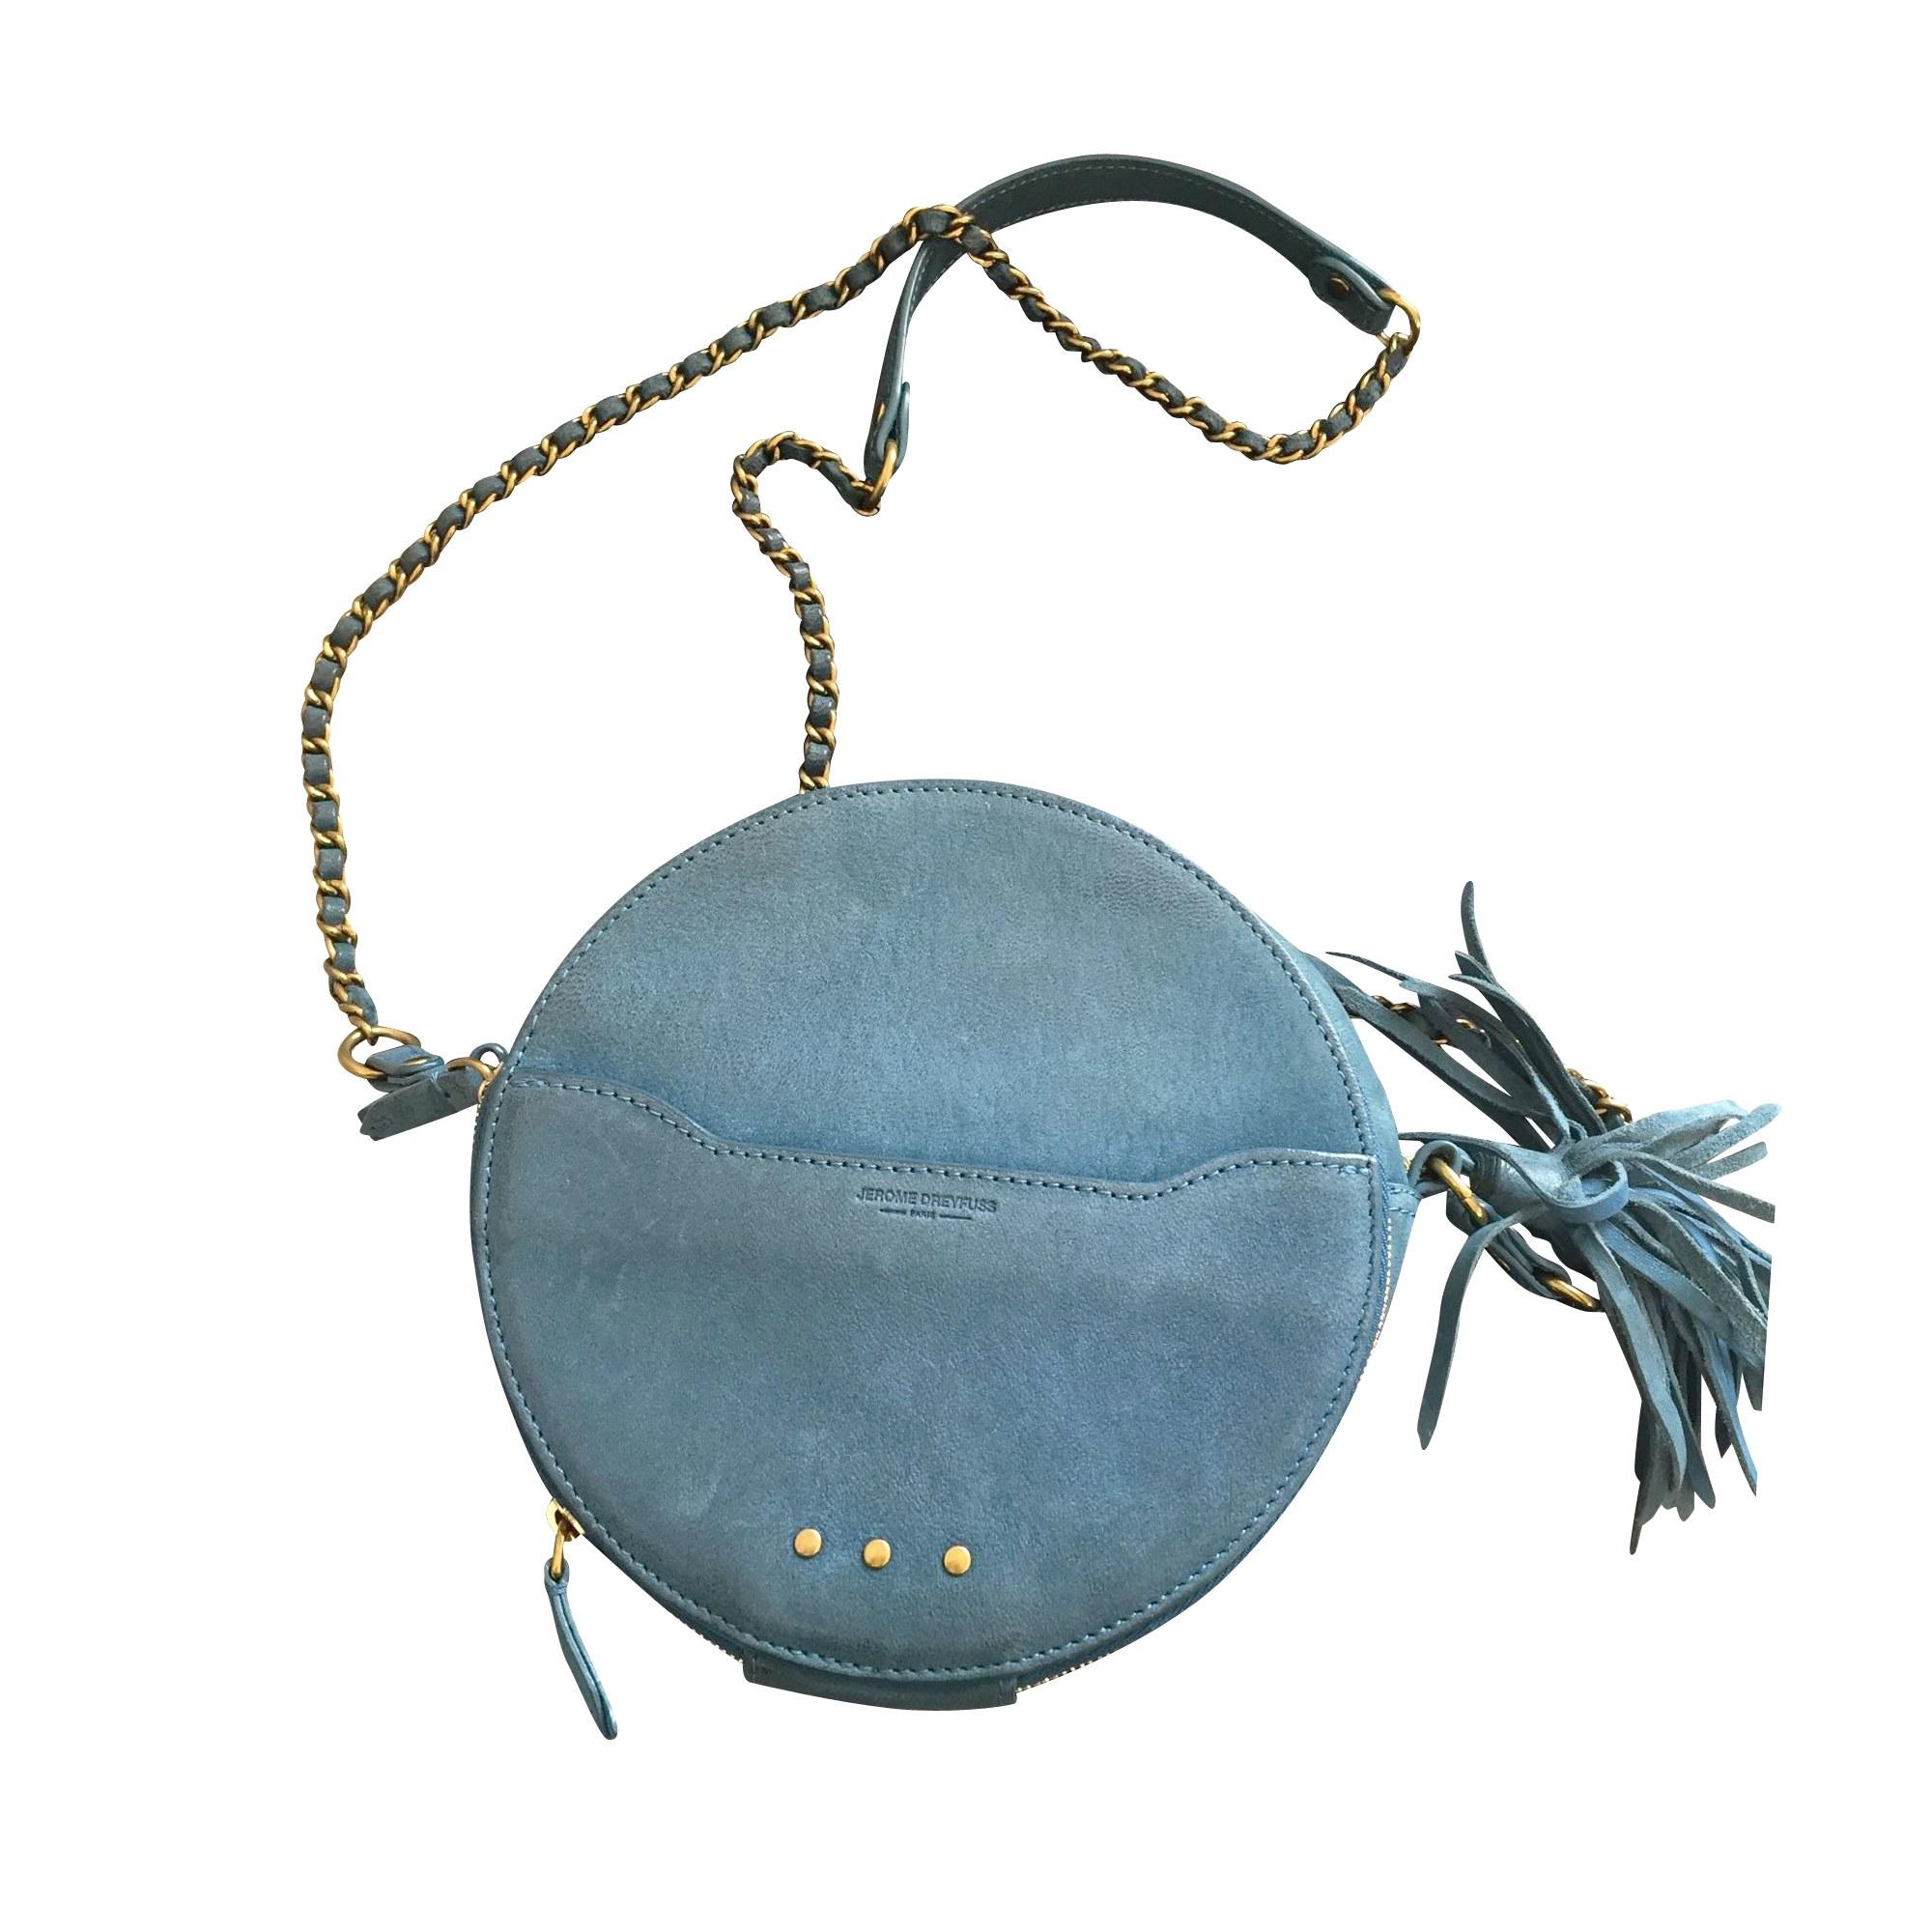 Sac en bandoulière en cuir JEROME DREYFUSS Bleu, bleu marine, bleu turquoise